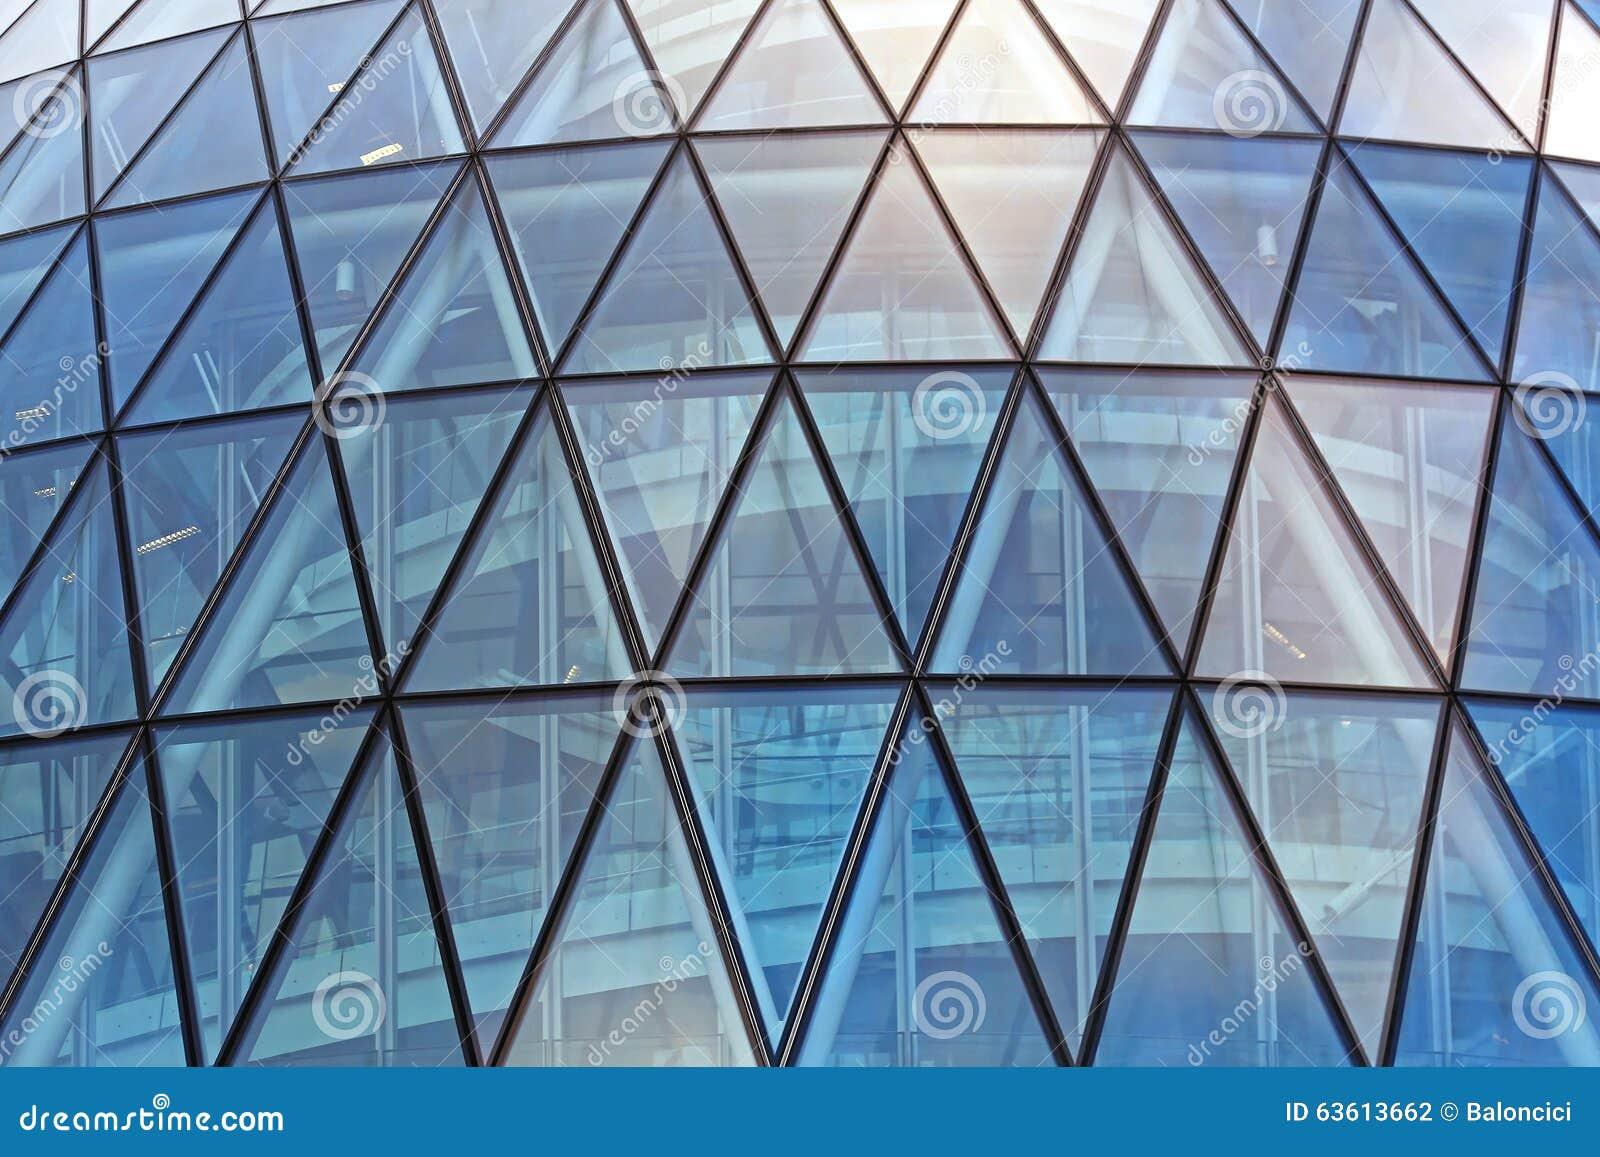 Triangle Windows Stock Photo Image Of Triangular Window